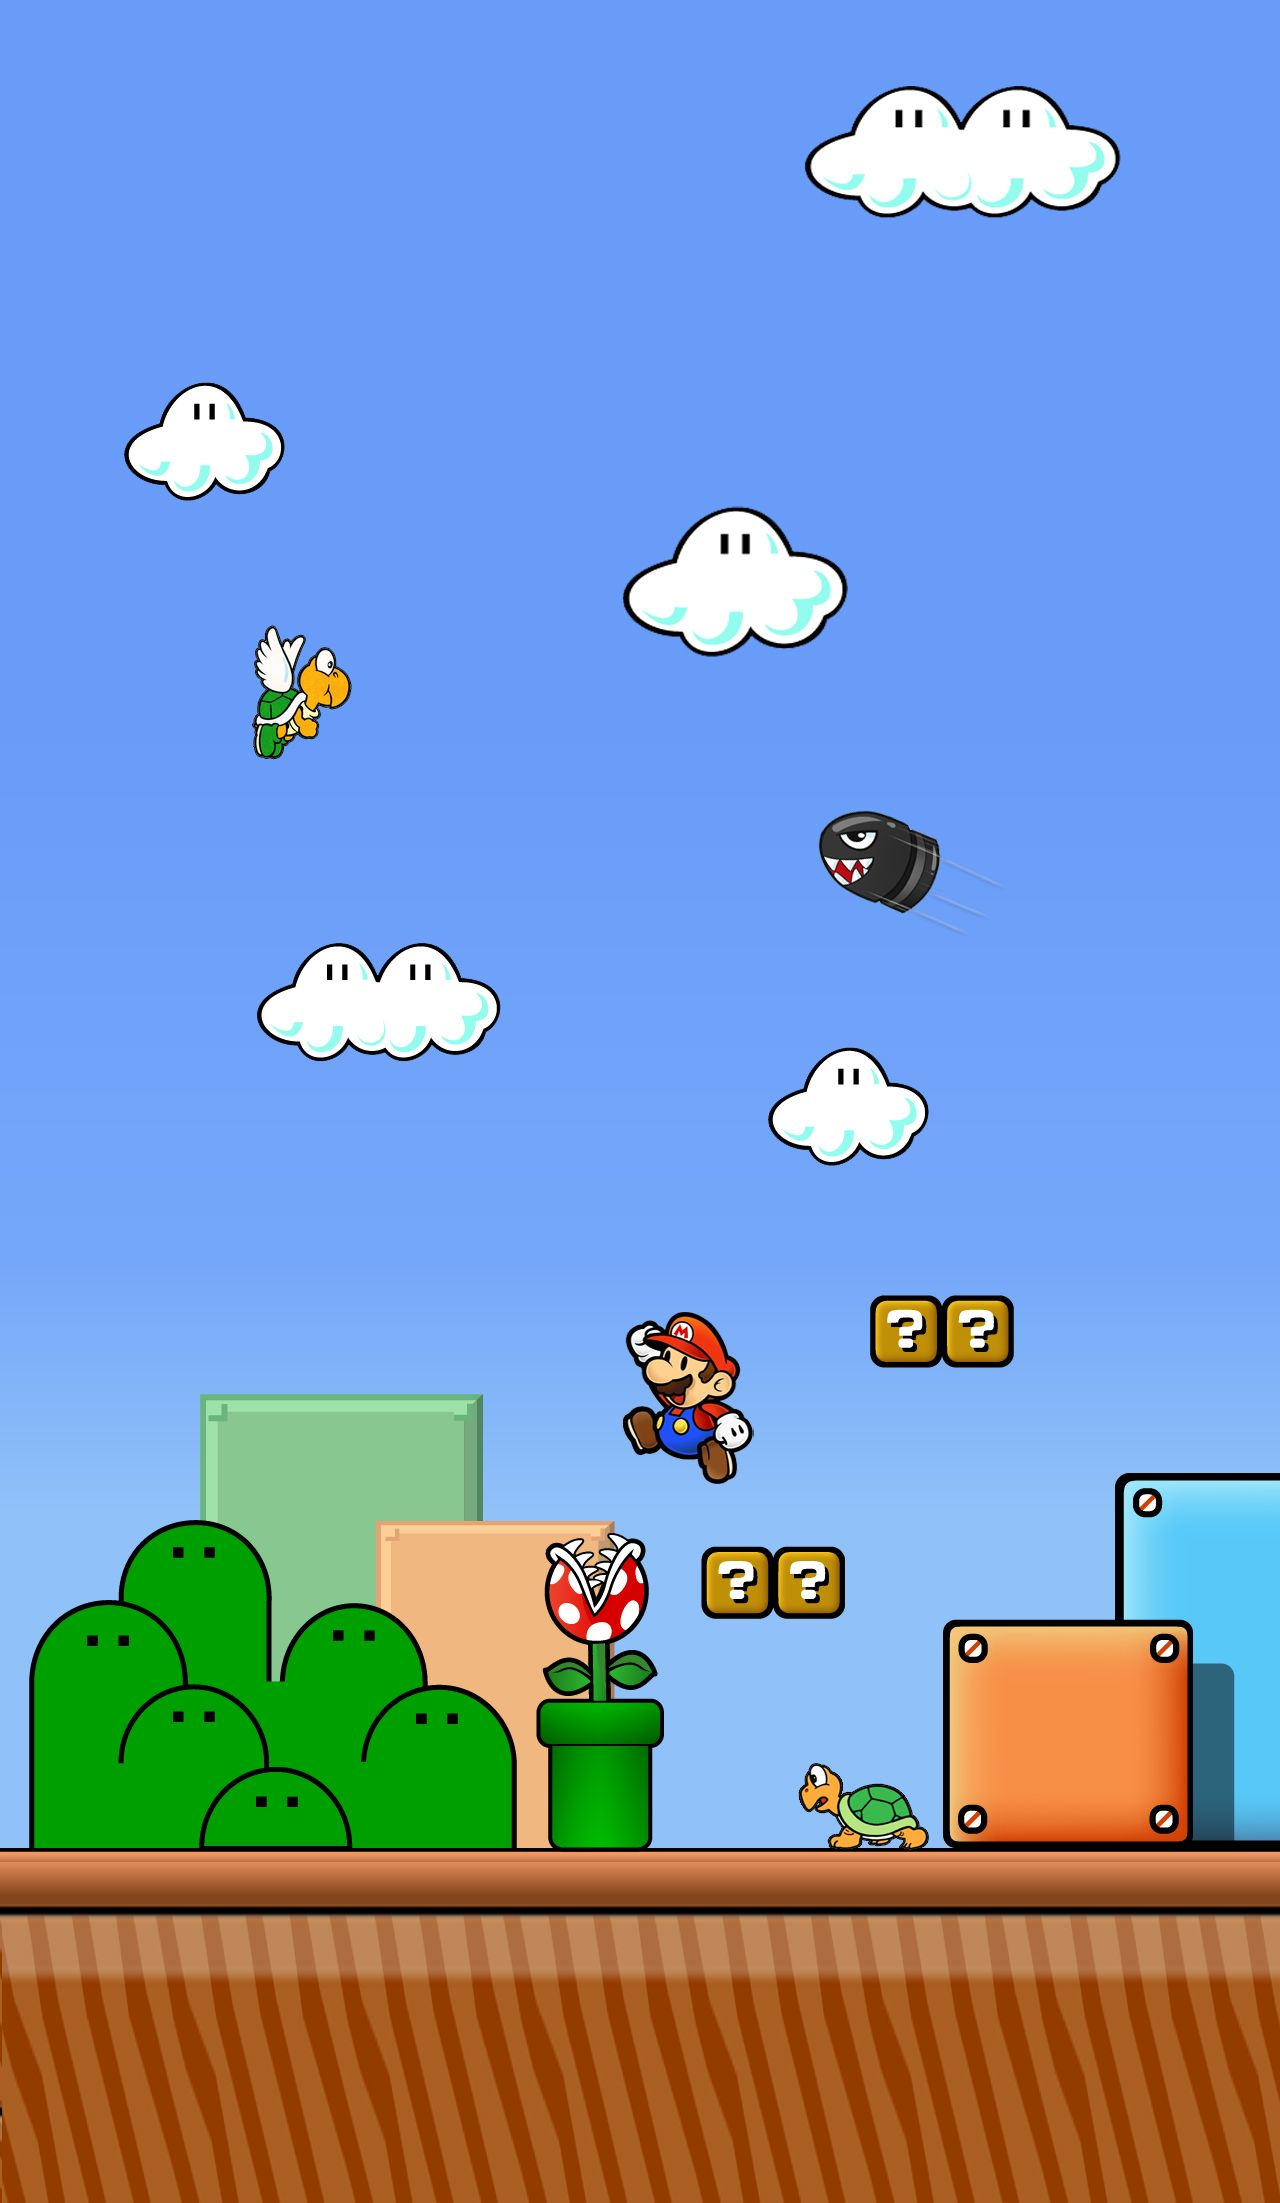 Super Mario World Wallpaper | IPhone Wallpaper | Super mario world, Iphone wallpaper, World ...